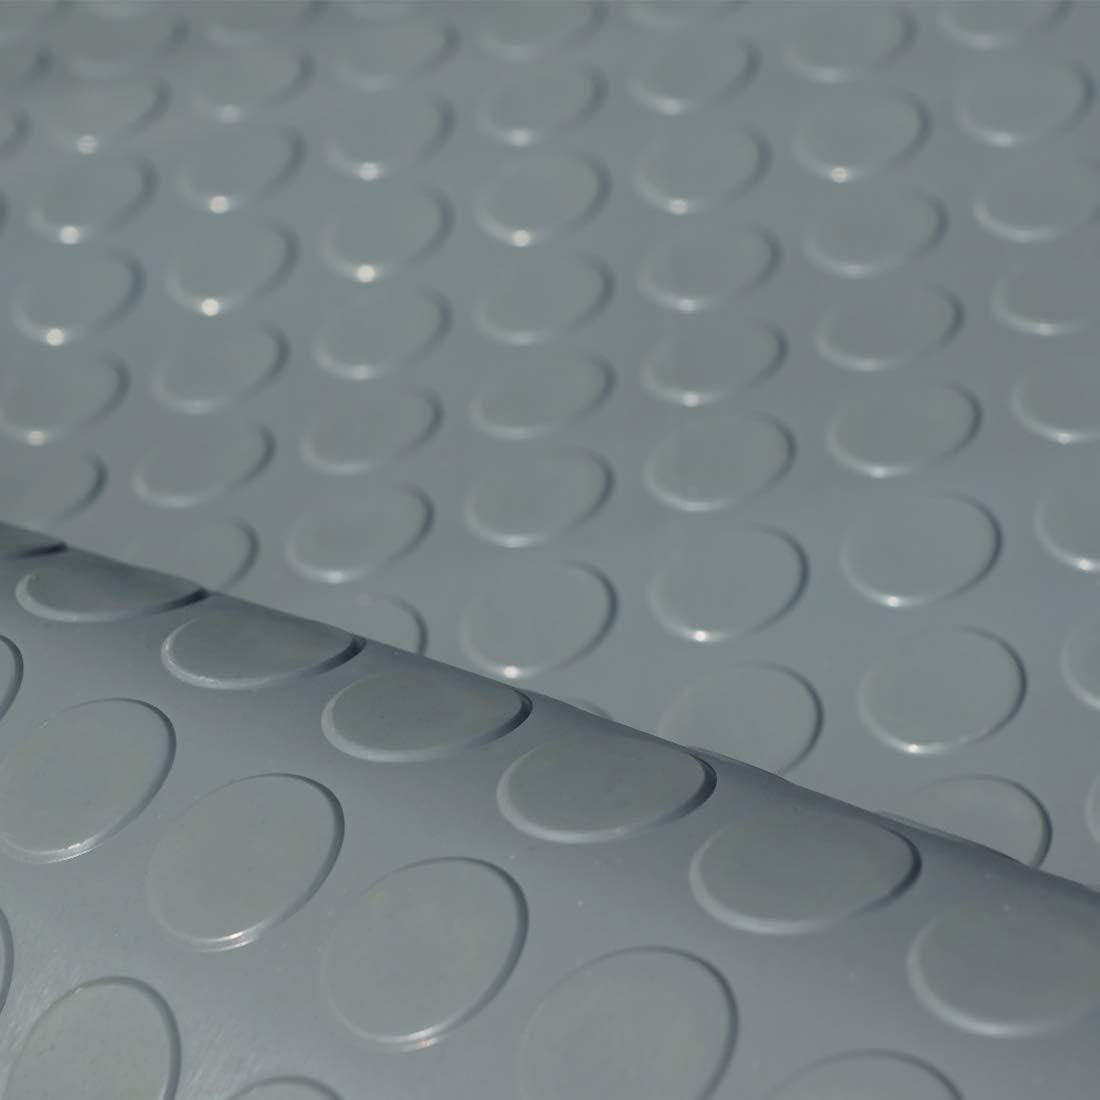 3m/² Noppenmatte 1,2 x 2,50 m St/ärke: 3mm Farbe: GRAU